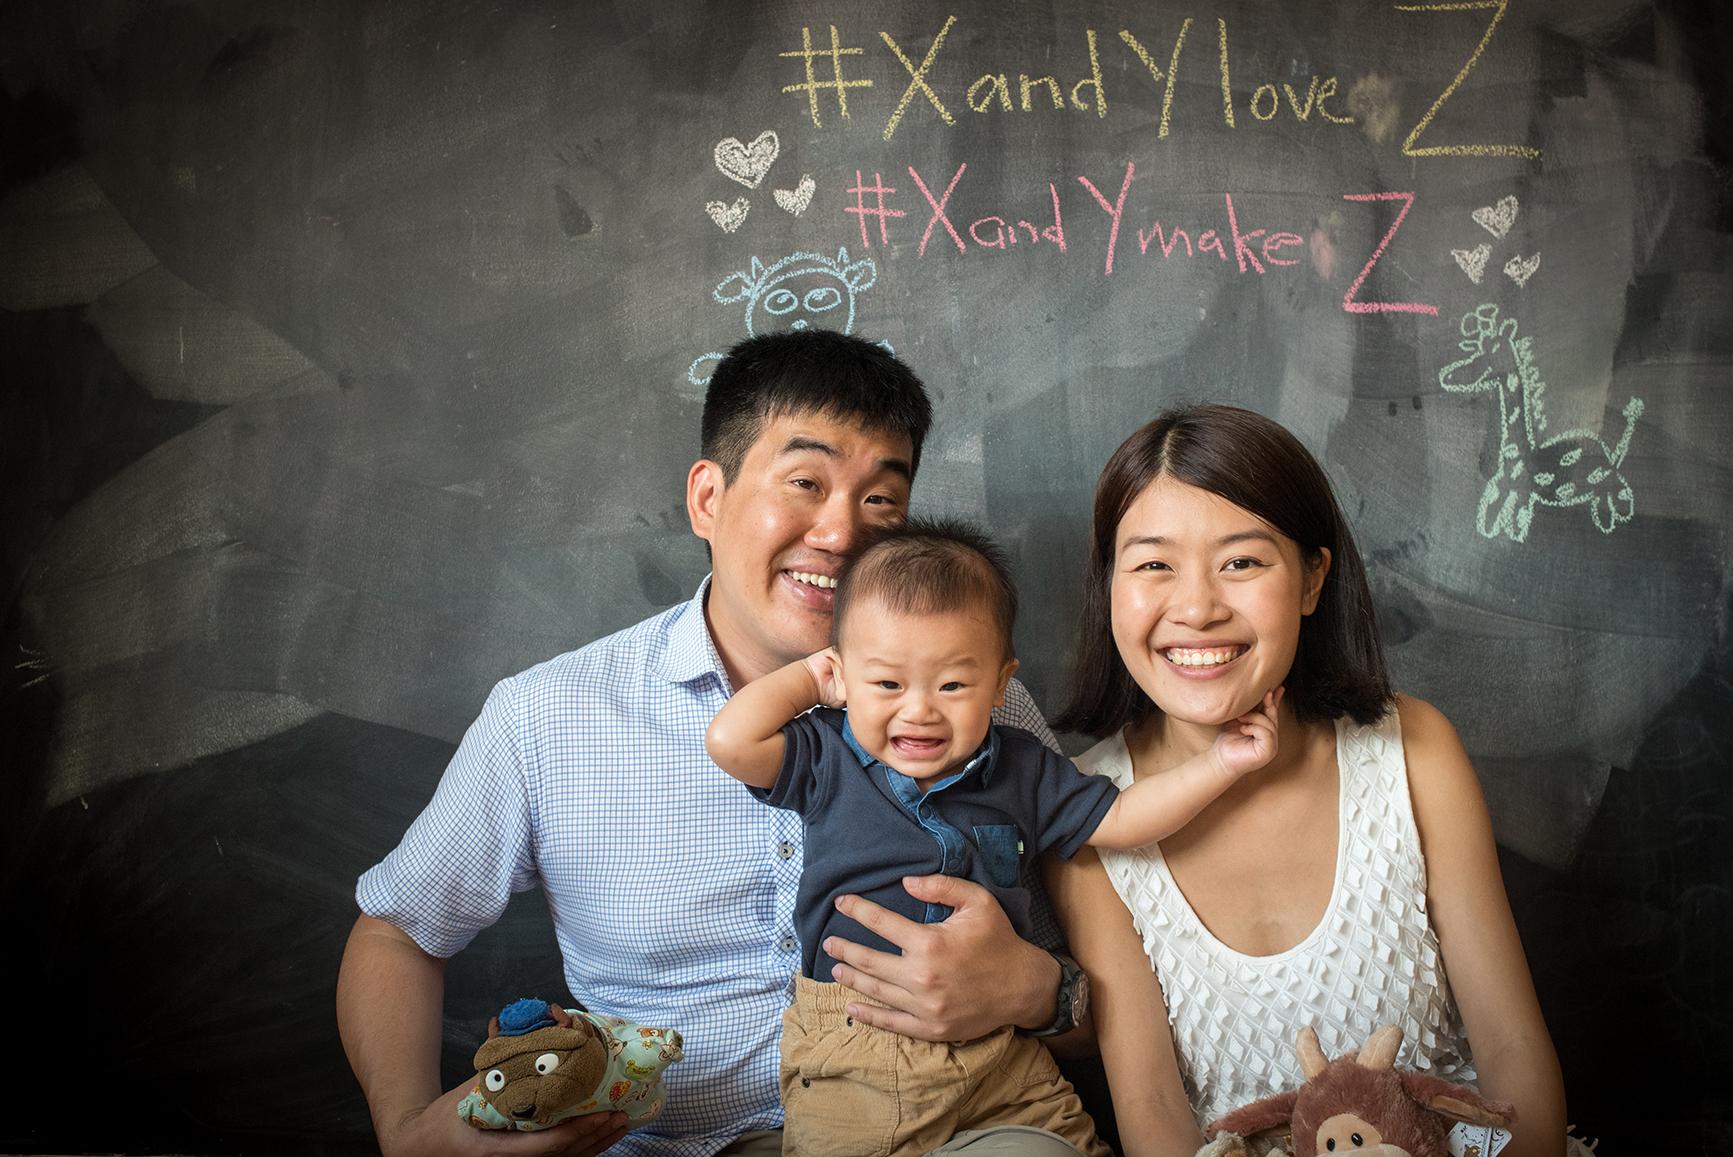 the-family-man-studio-zx-01